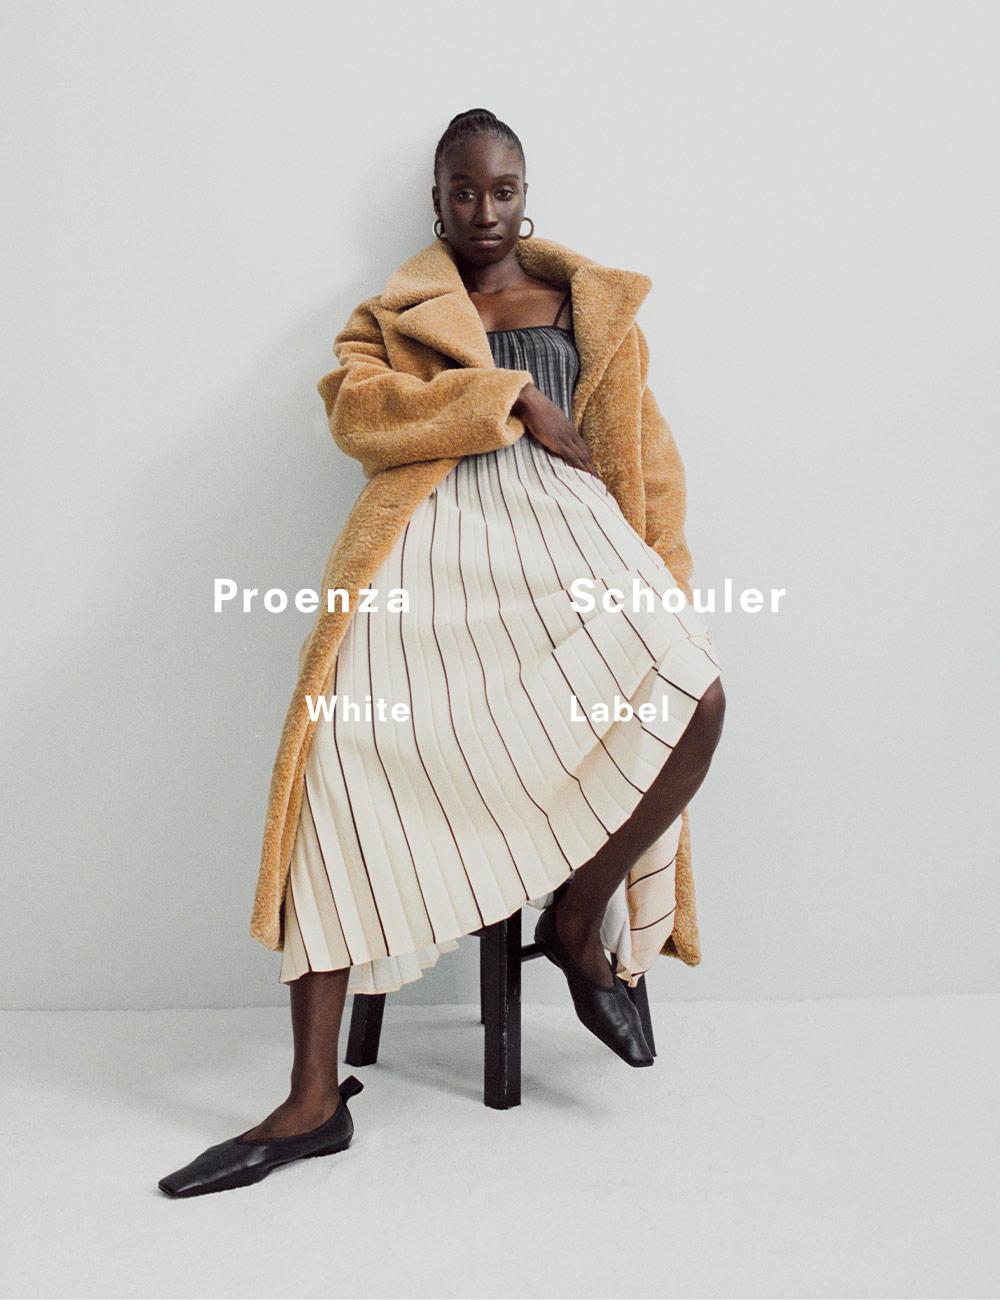 Proenza Schouler - White Label